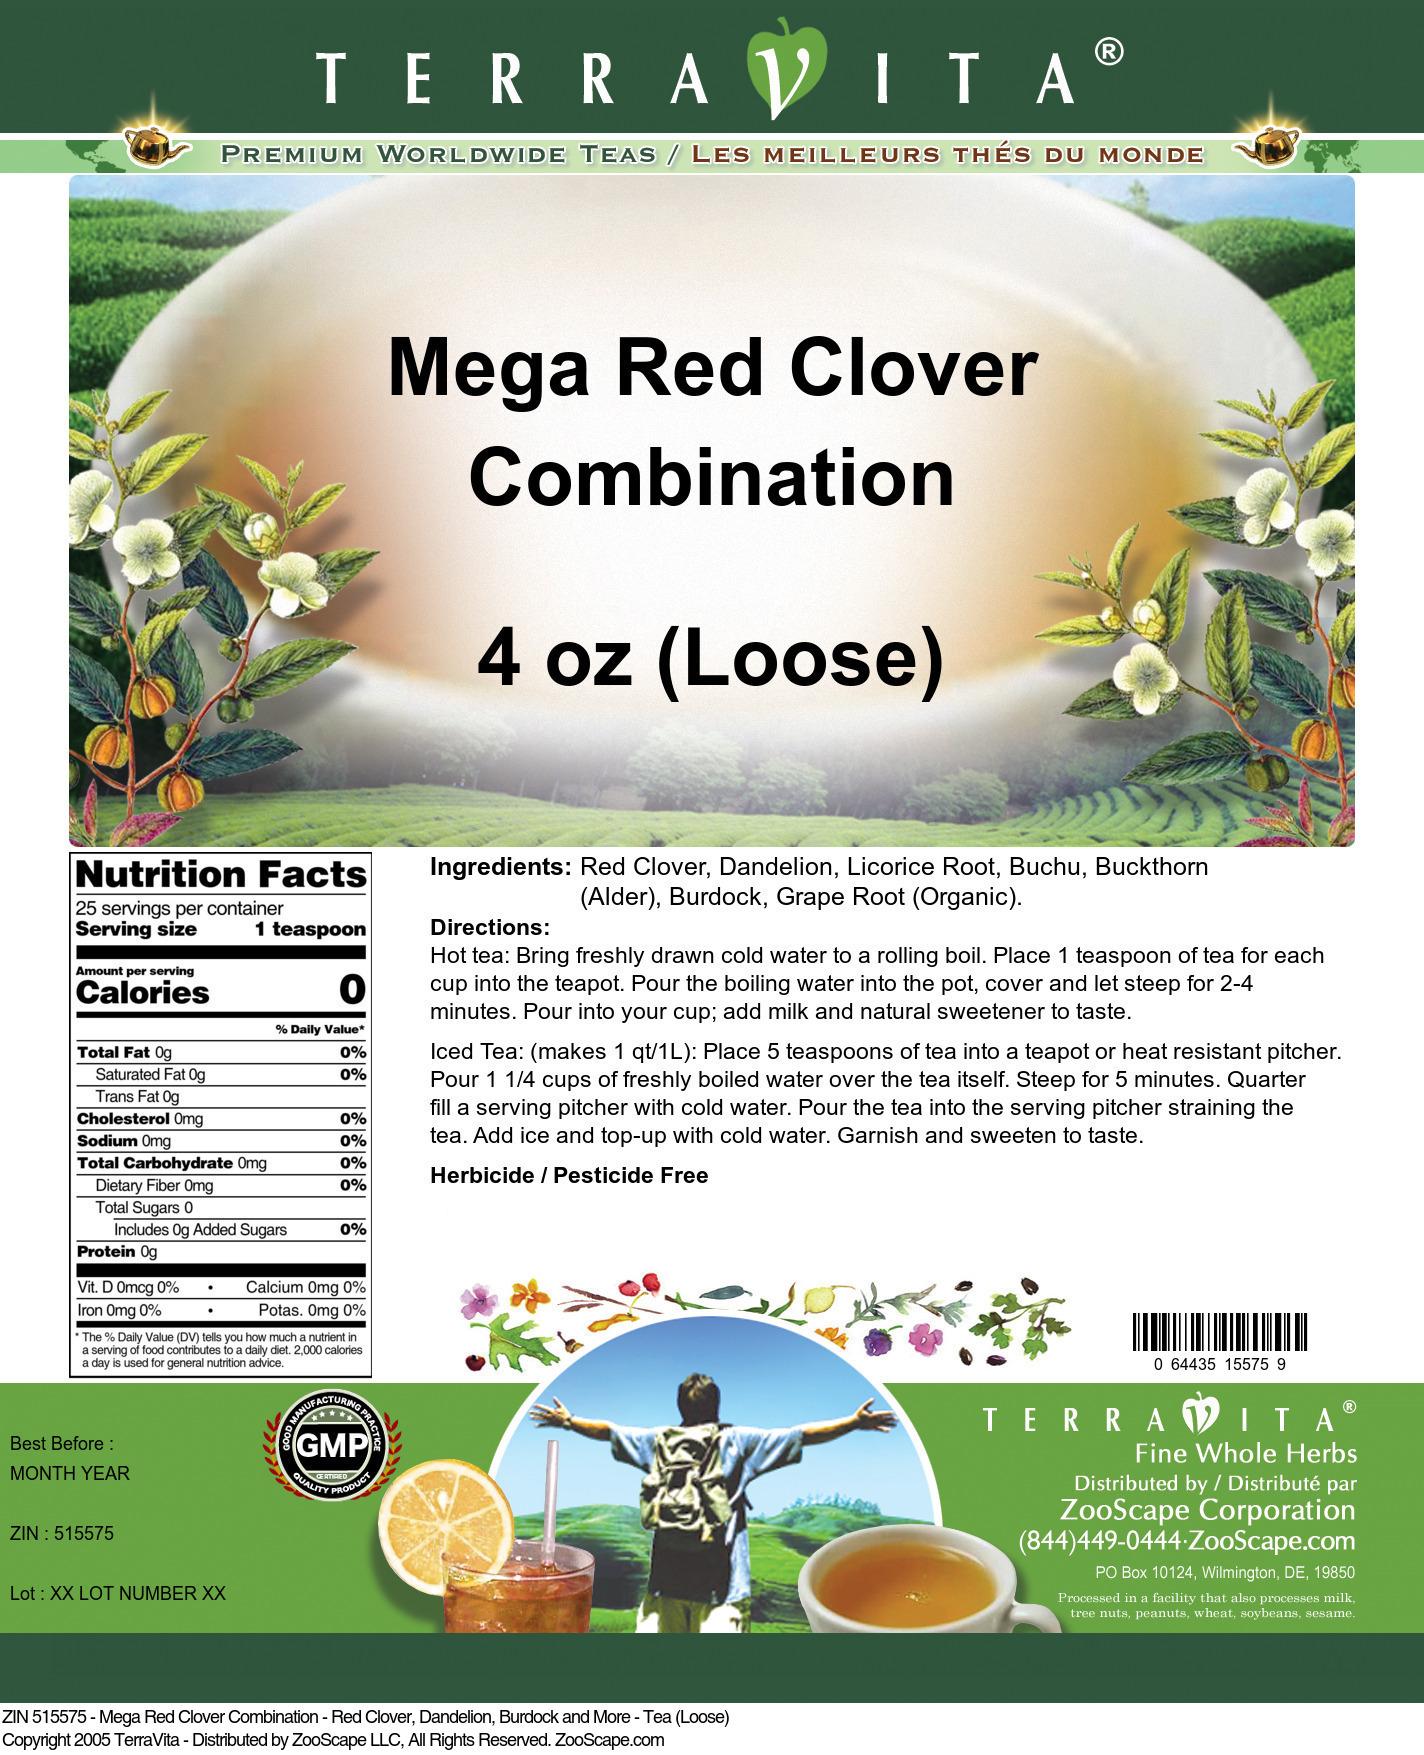 Mega Red Clover Combination - Red Clover, Dandelion, Burdock and More - Tea (Loose)